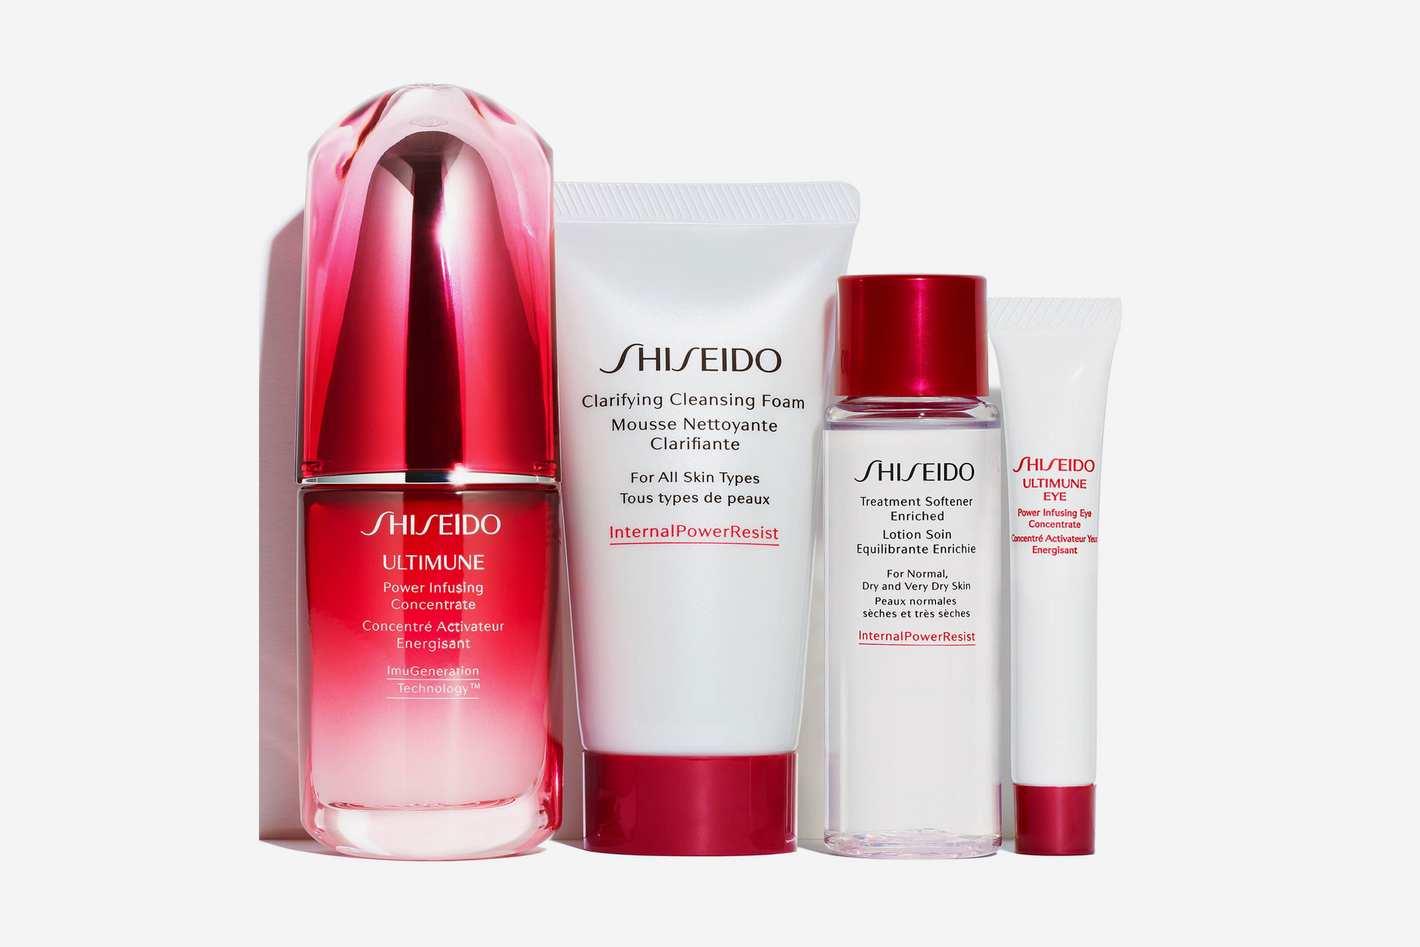 Shiseido Strengthen Defenses The Introductory Regimen Set